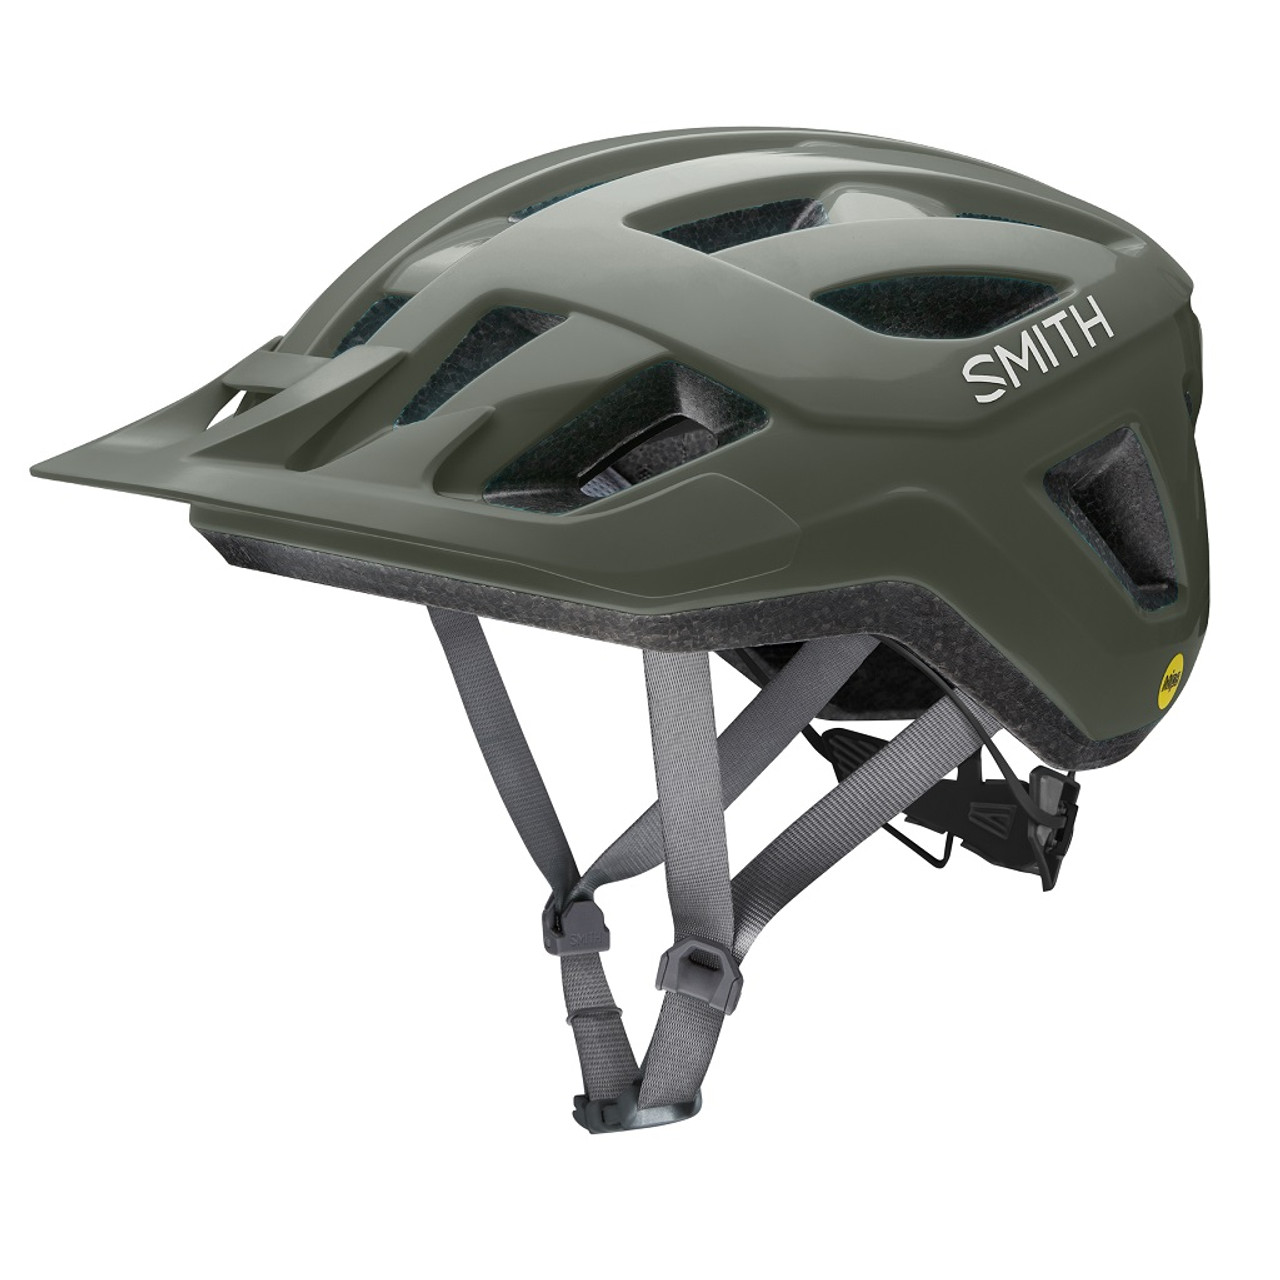 Sage - Smith Convoy Bike Helmet